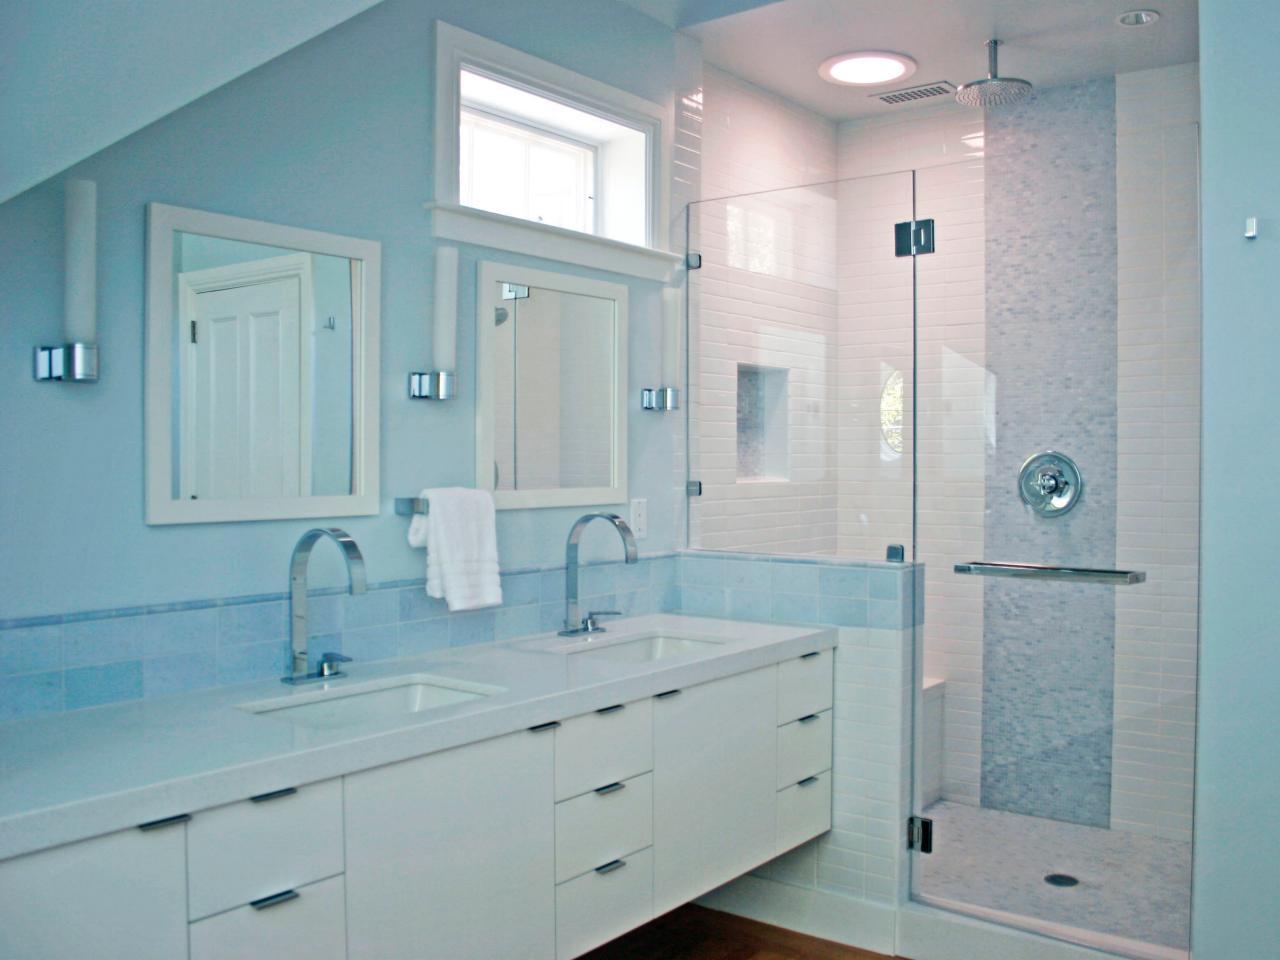 Baby Blue Bathroom With Modern Fixtures